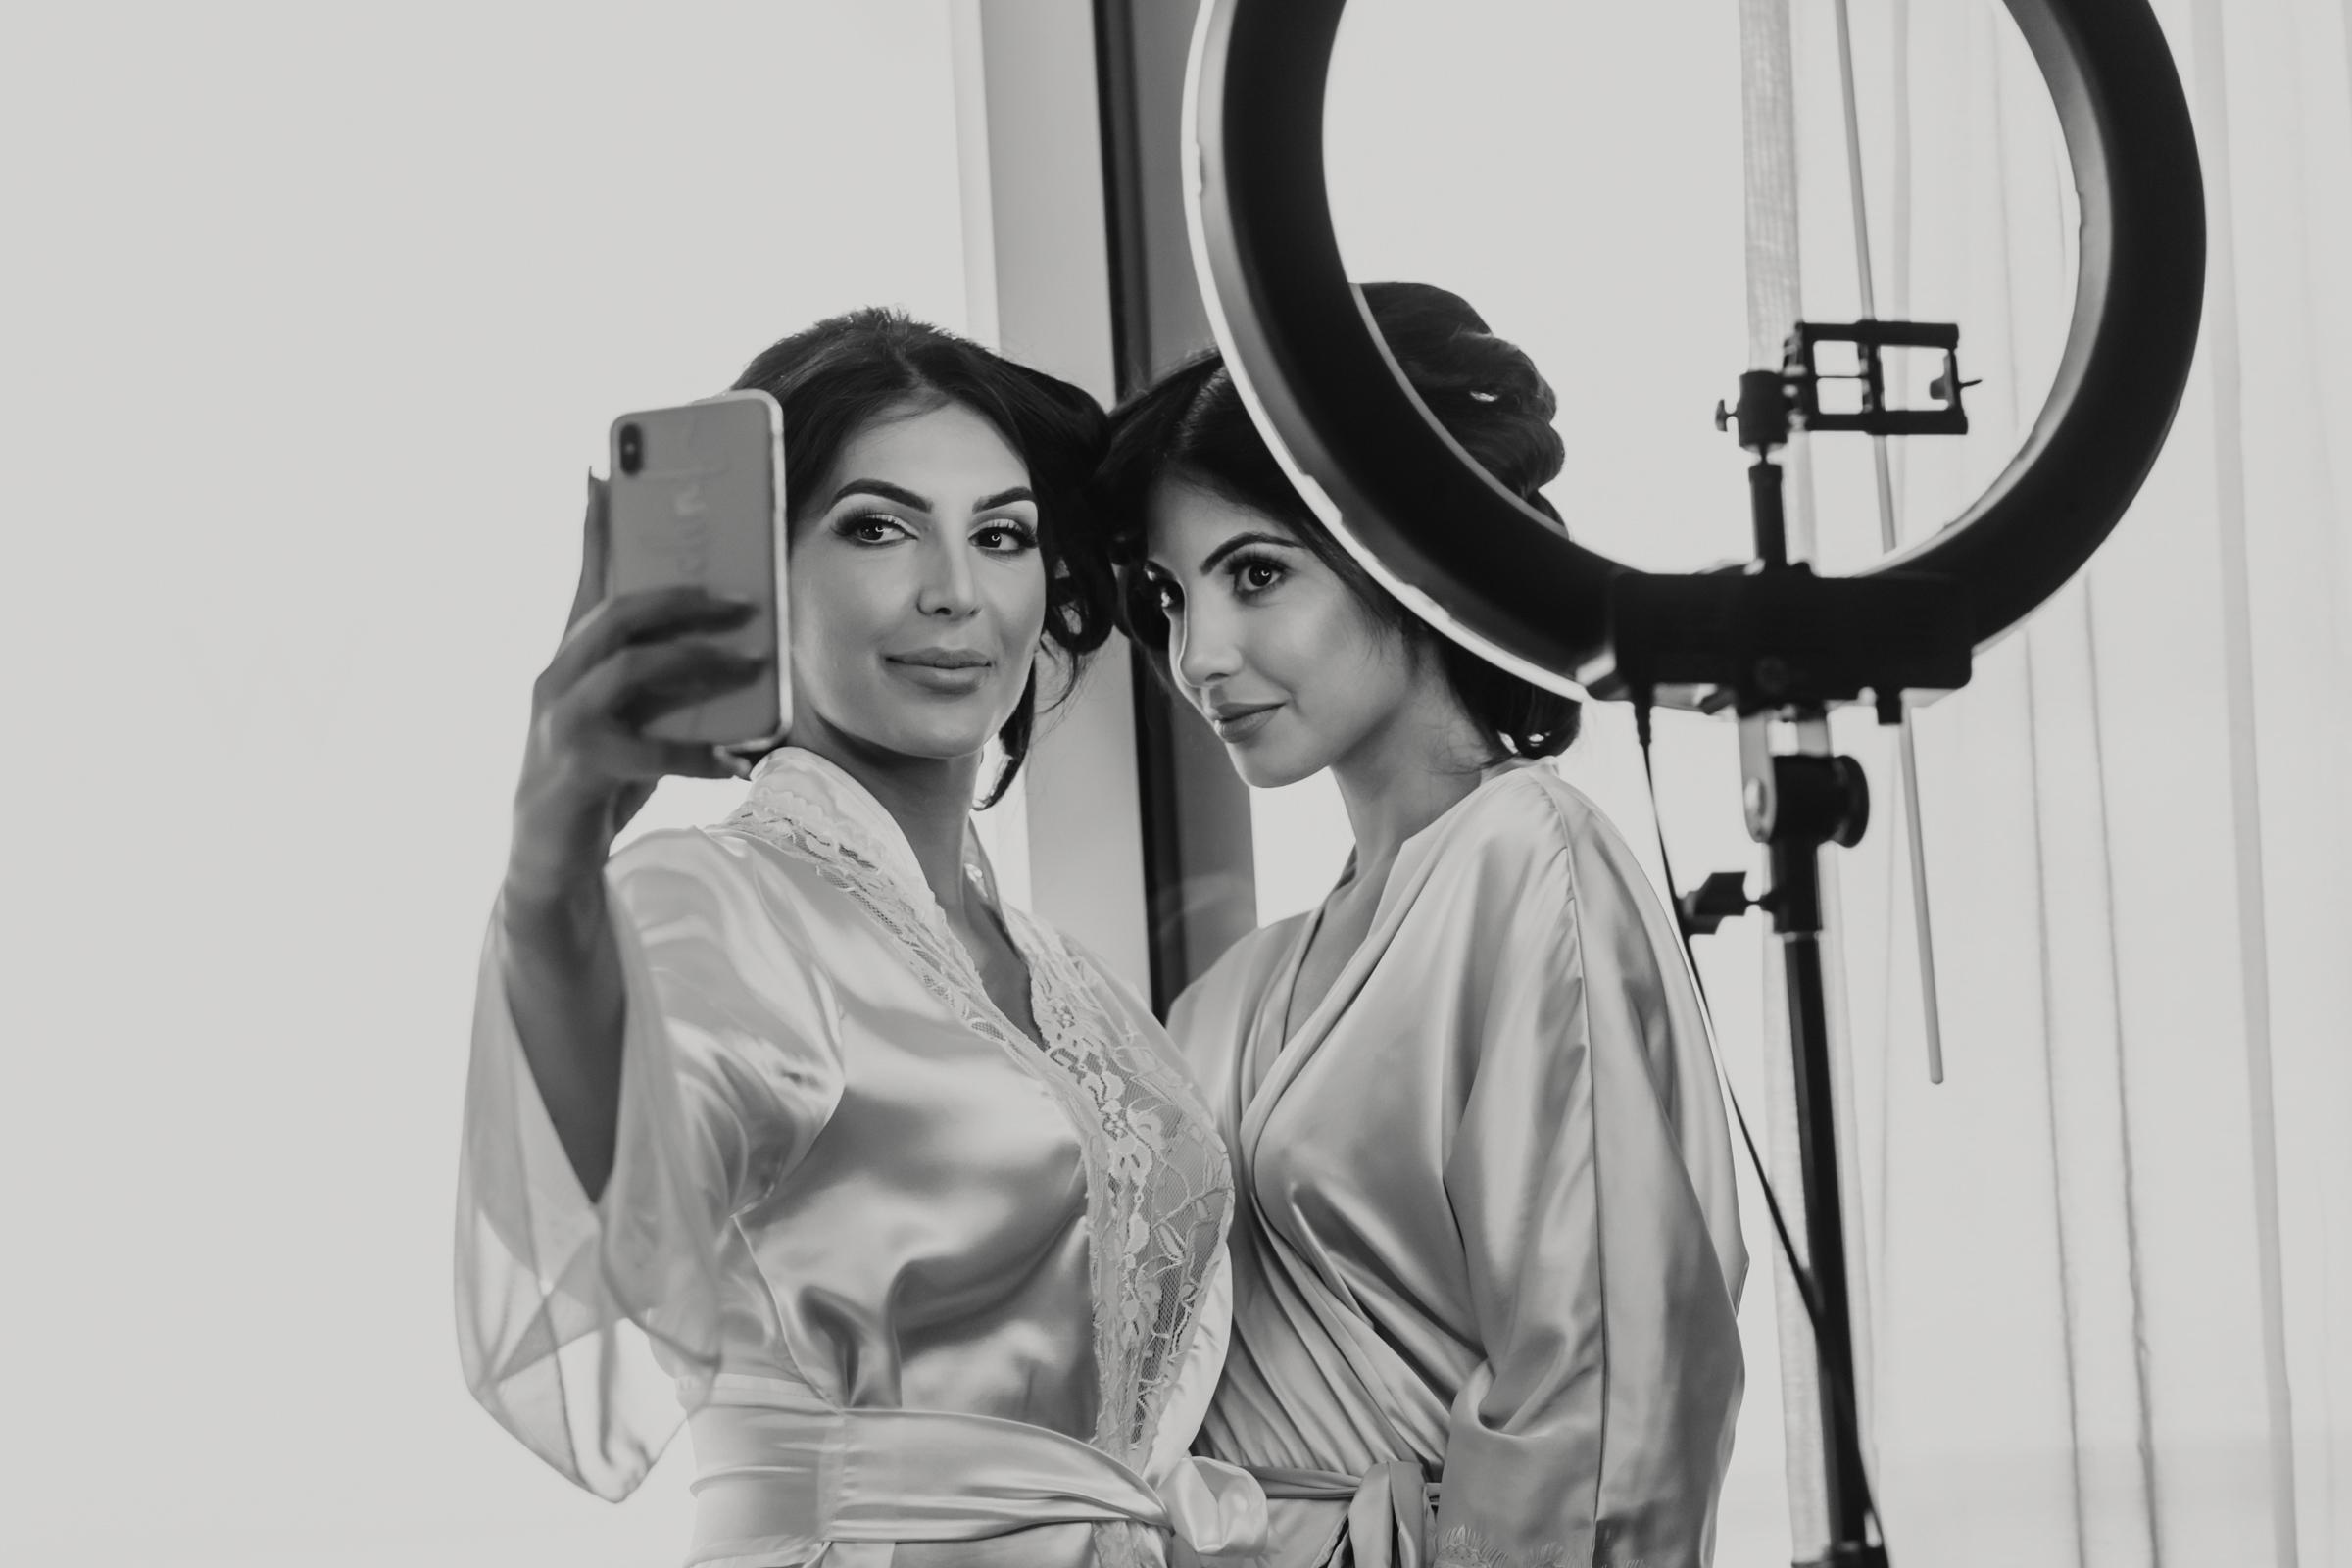 Twin sisters taking selfie with beauty light - photo by El Marco Rojo